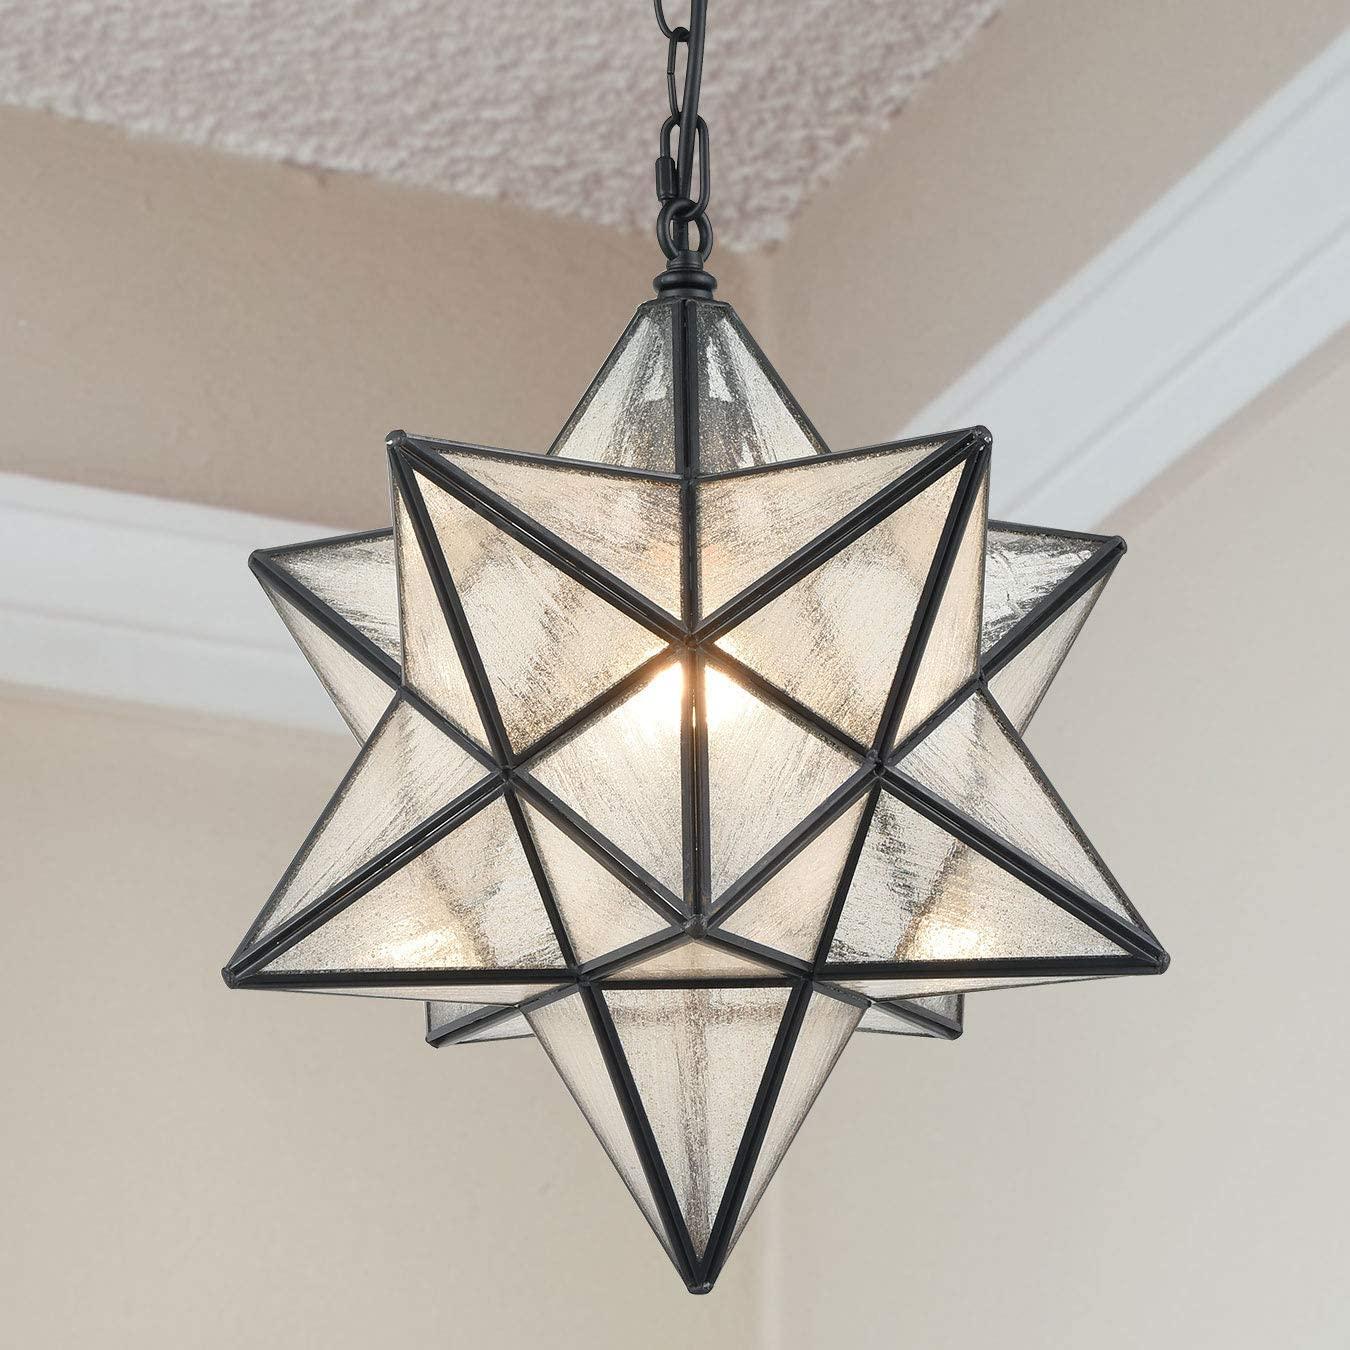 Lámpara colgante moderna con forma de estrella Morava, luces elegantes de gran estrella de cristal para cocina, pasillo, dormitorio, Bar, Club, puerta delantera